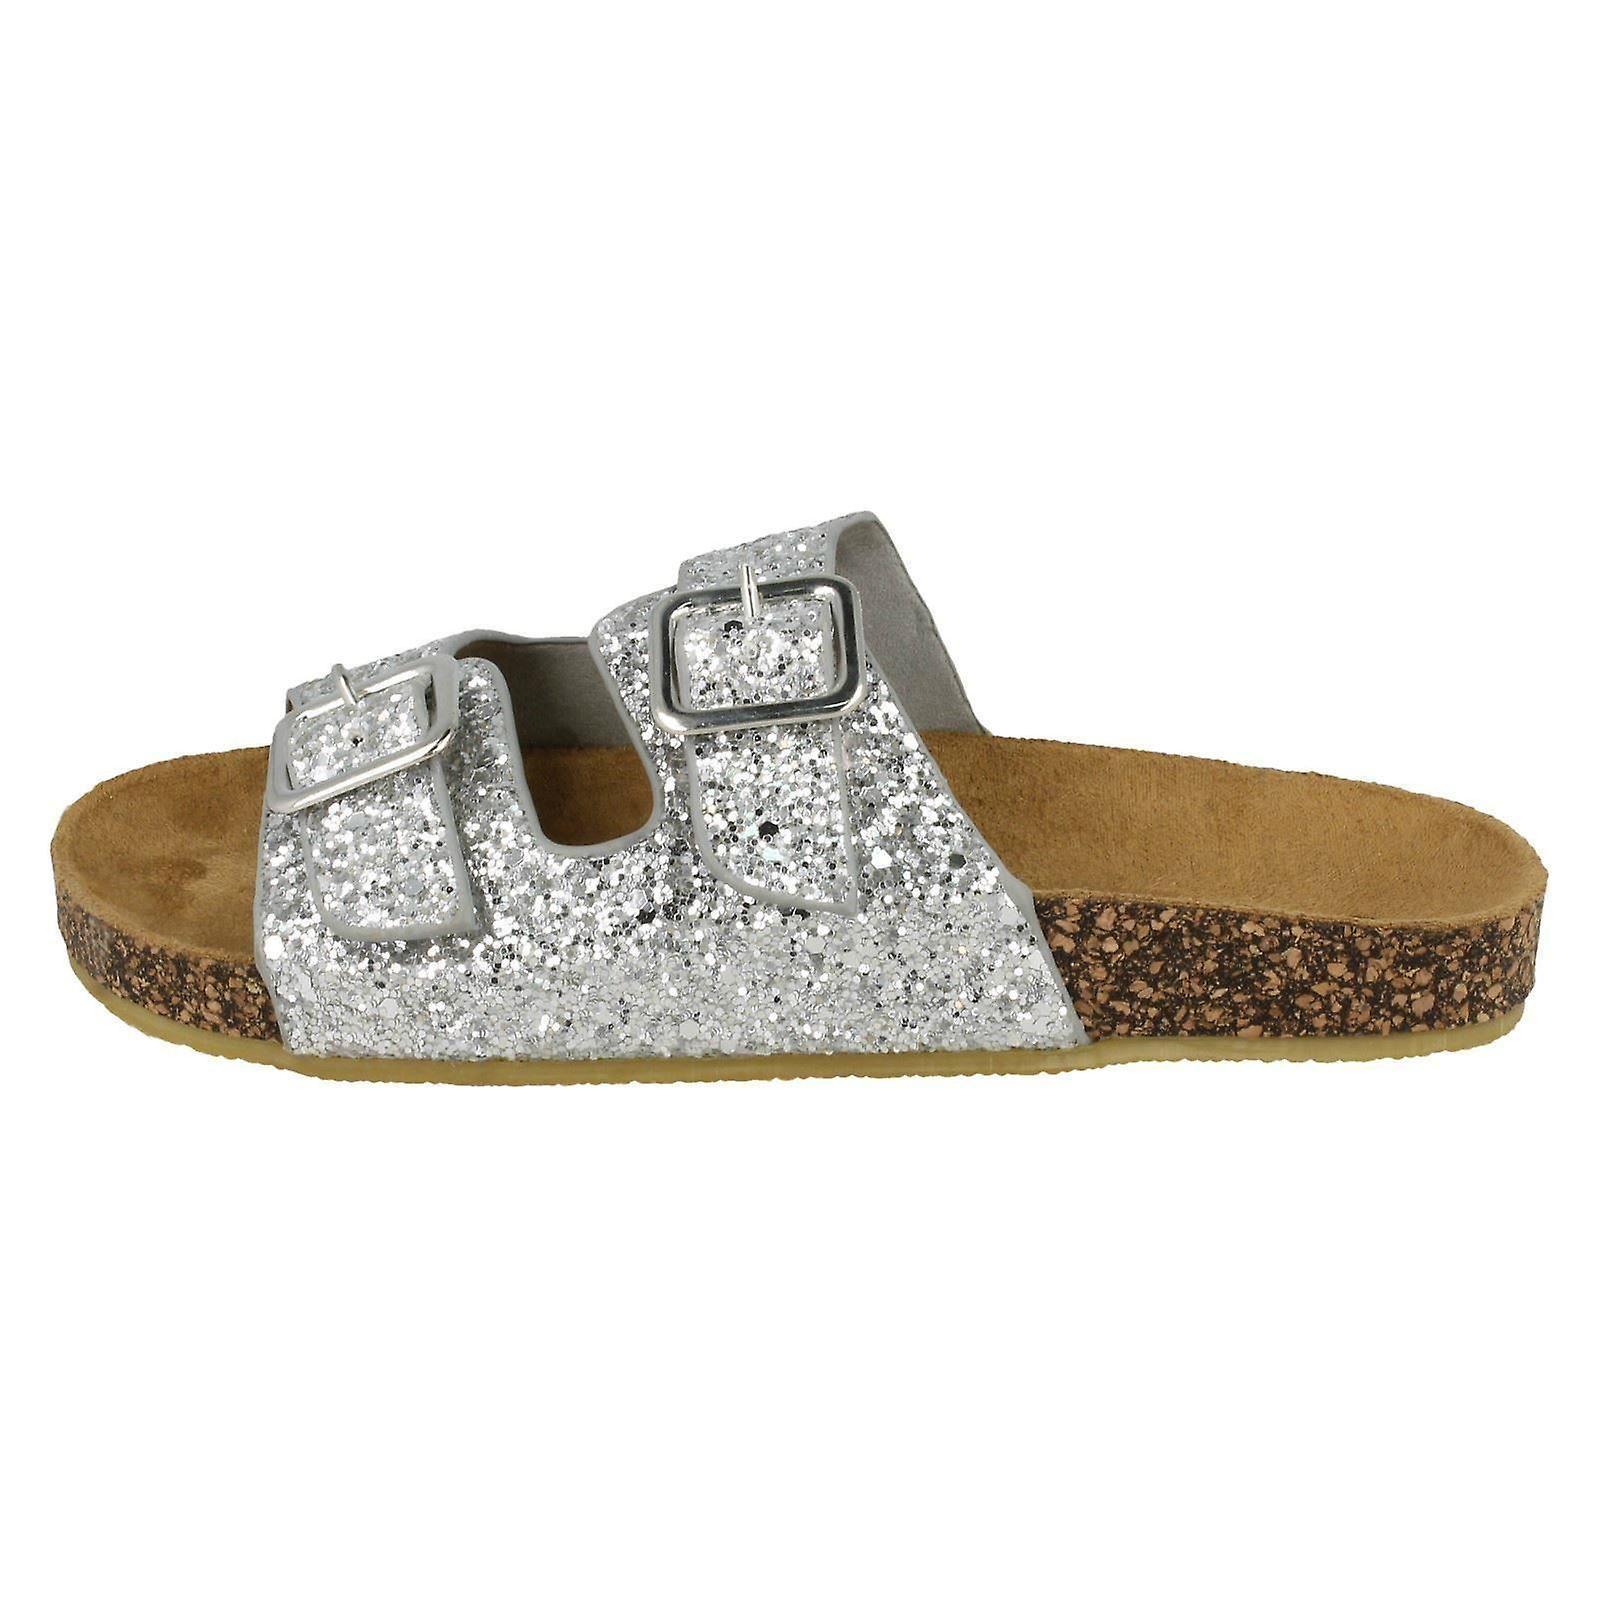 Spot de filles sur Glitter Sandals - Glitter argent - UK taille 12 - UE taille 30 - taille US 13 DOVwlR